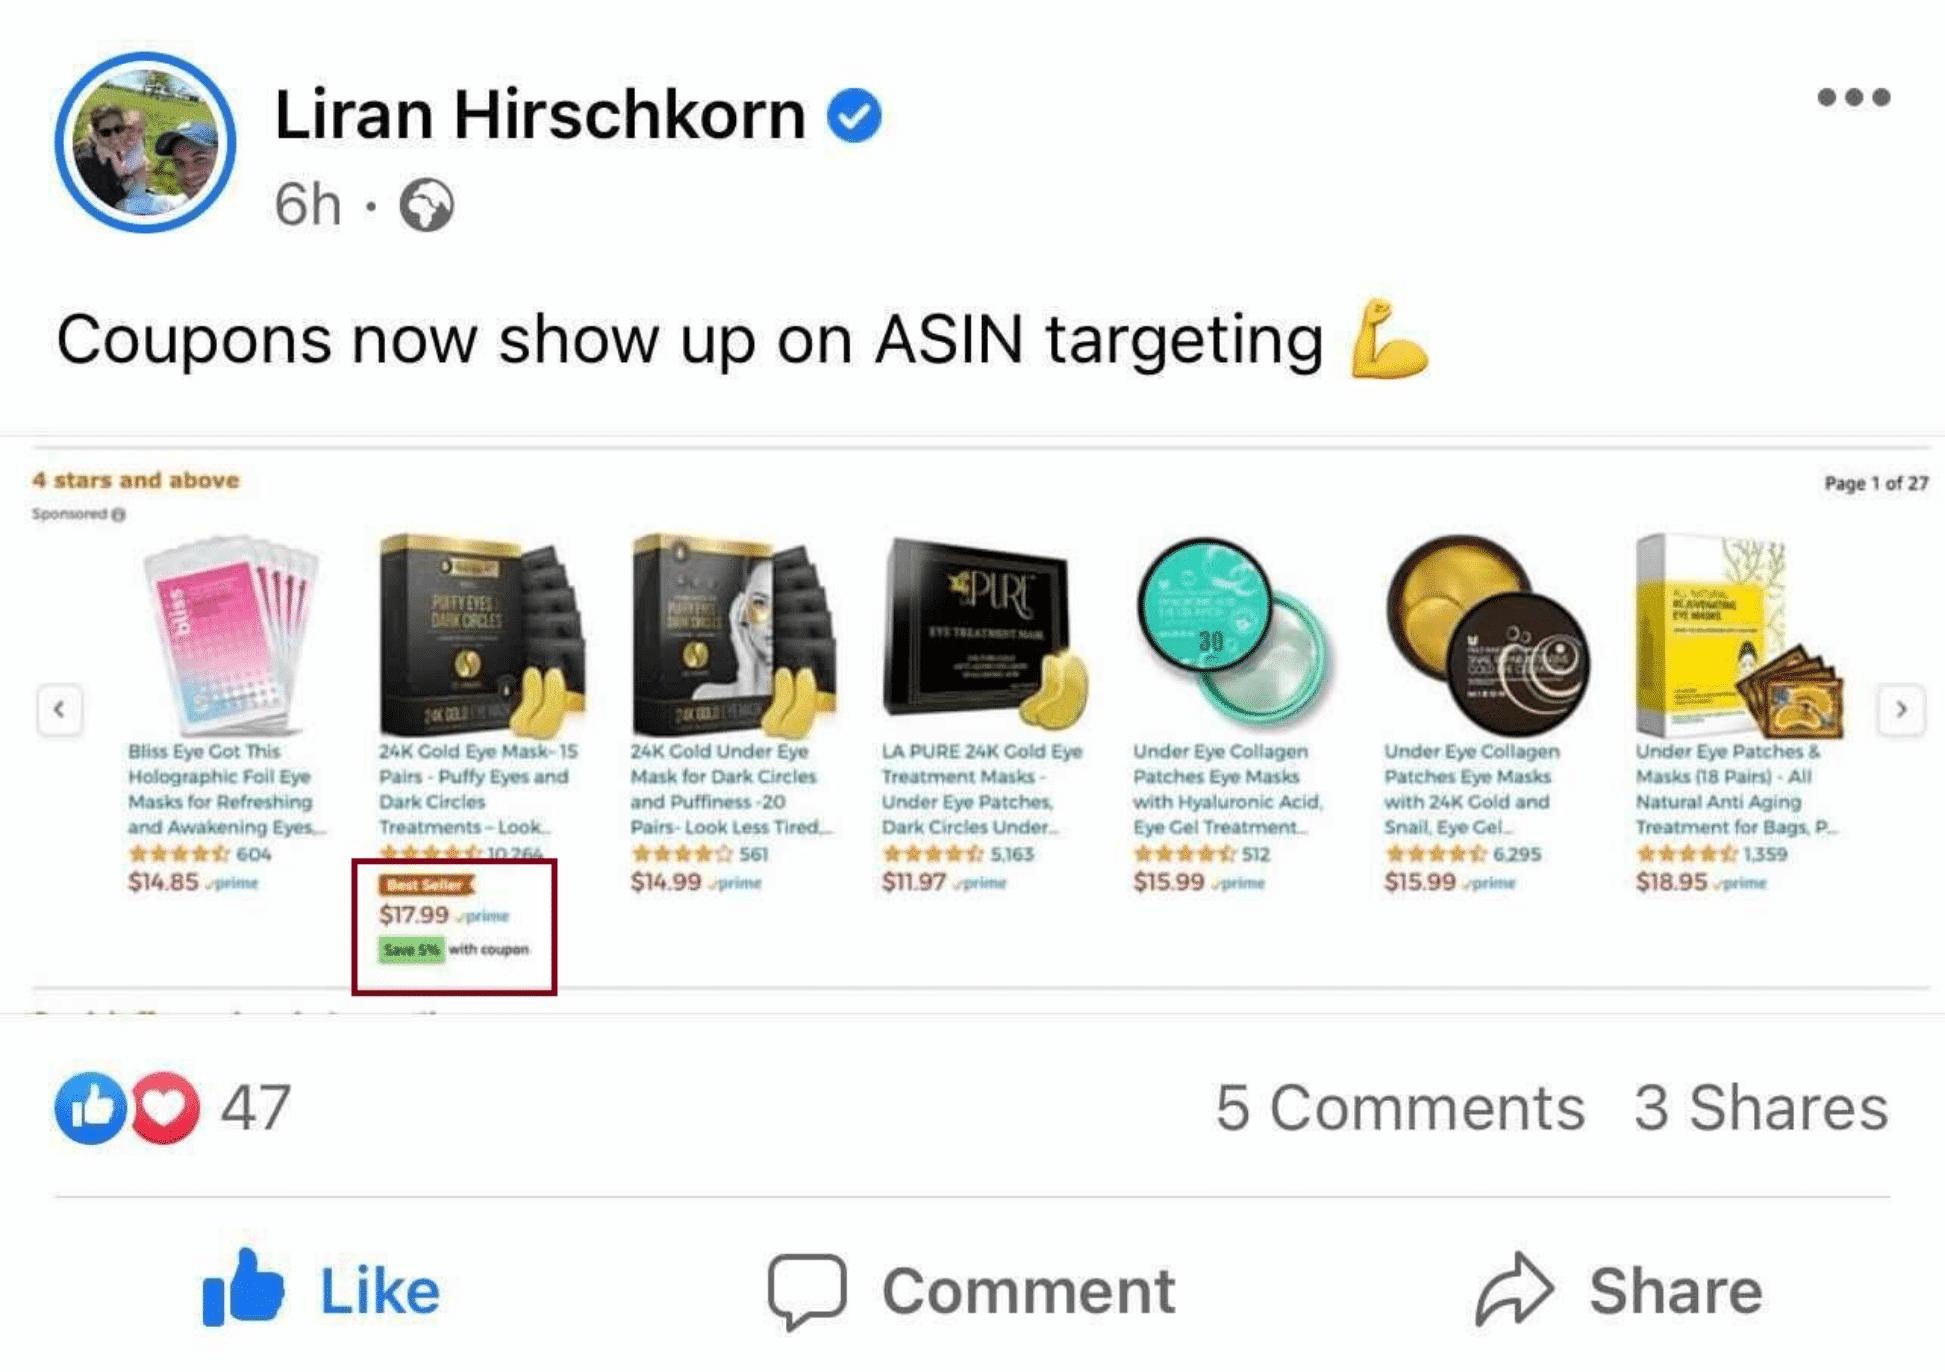 Coupons in ASIN targeting